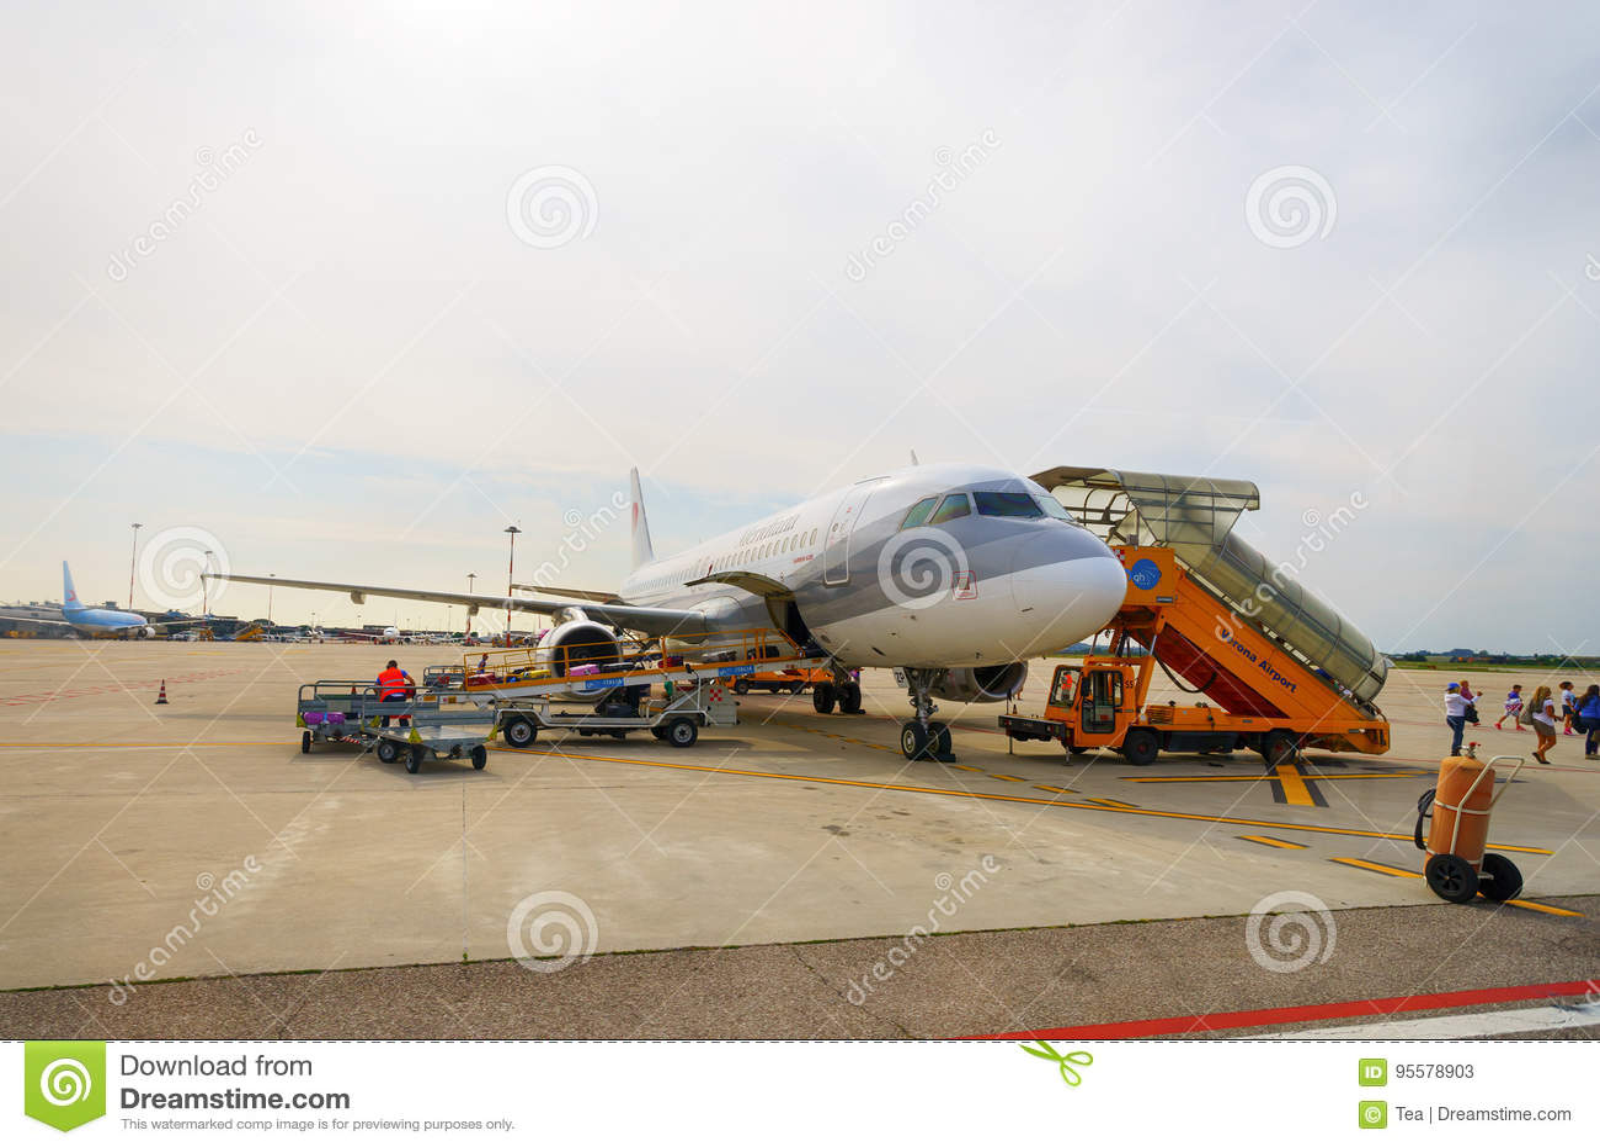 Jet Flight In Verona Airport Editorial Stock Photo - Image ...